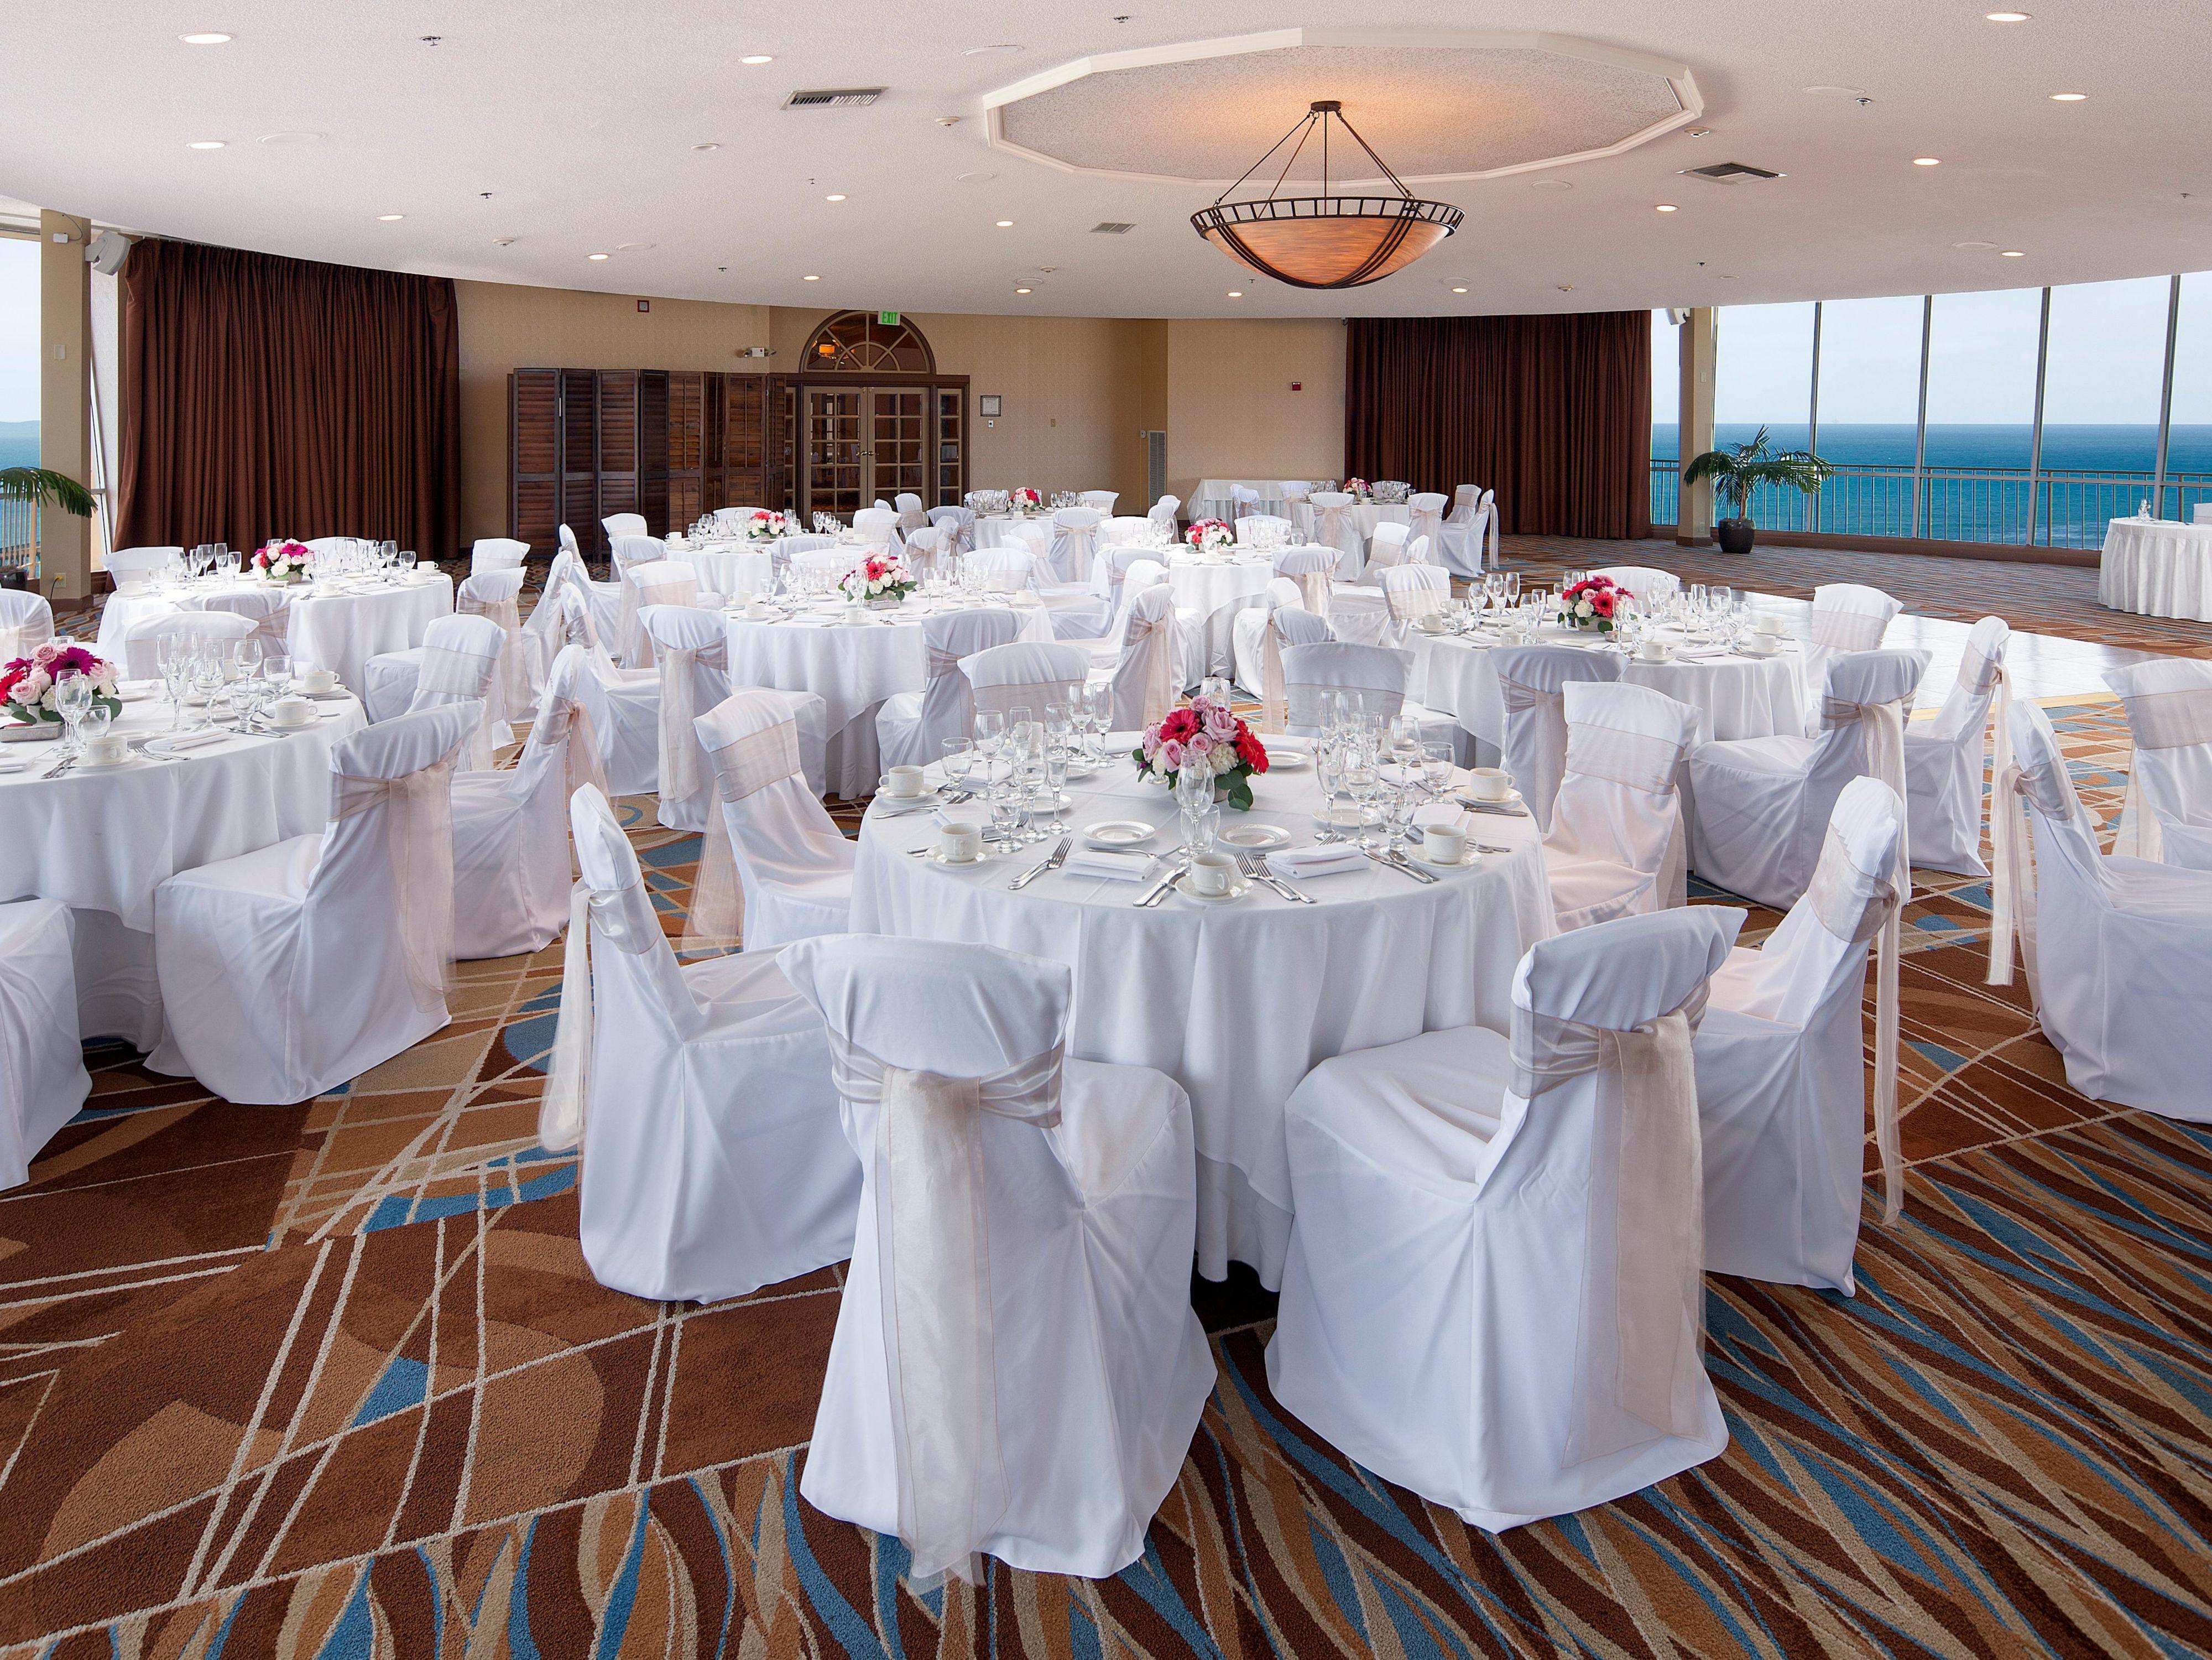 Banquetroomphoto Crowne Plaza Ventura Beach Hotel Ballroom Specialeventsphoto